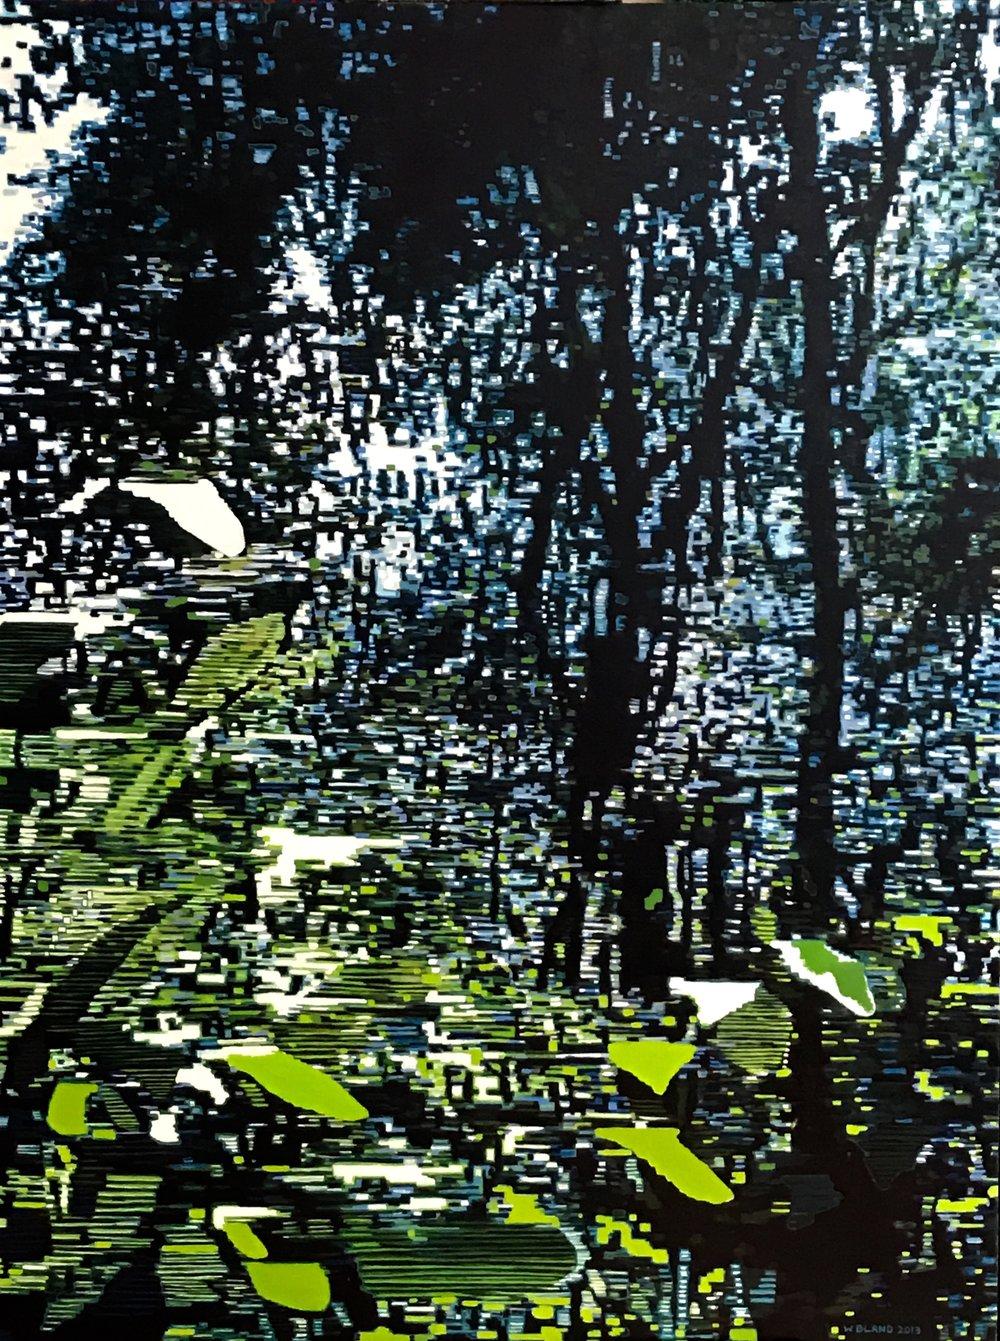 "Jungle, Oil on Linen, 36"" x 48"", 2013"